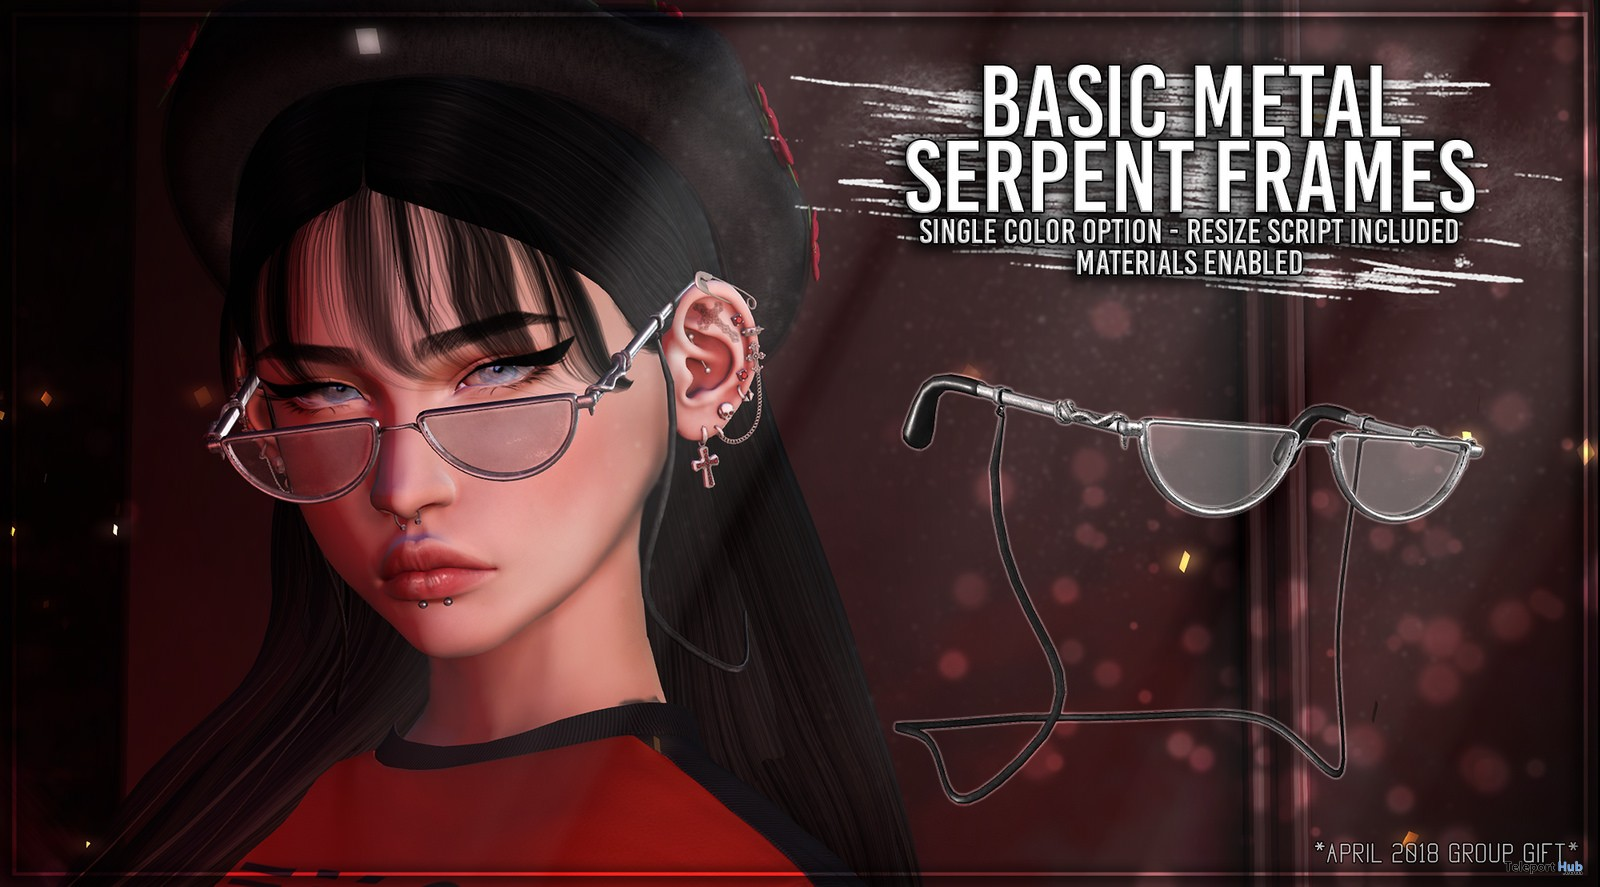 Basic Metal Serpent Frames April 2018 Group Gift by Asteroidbox - Teleport Hub - teleporthub.com